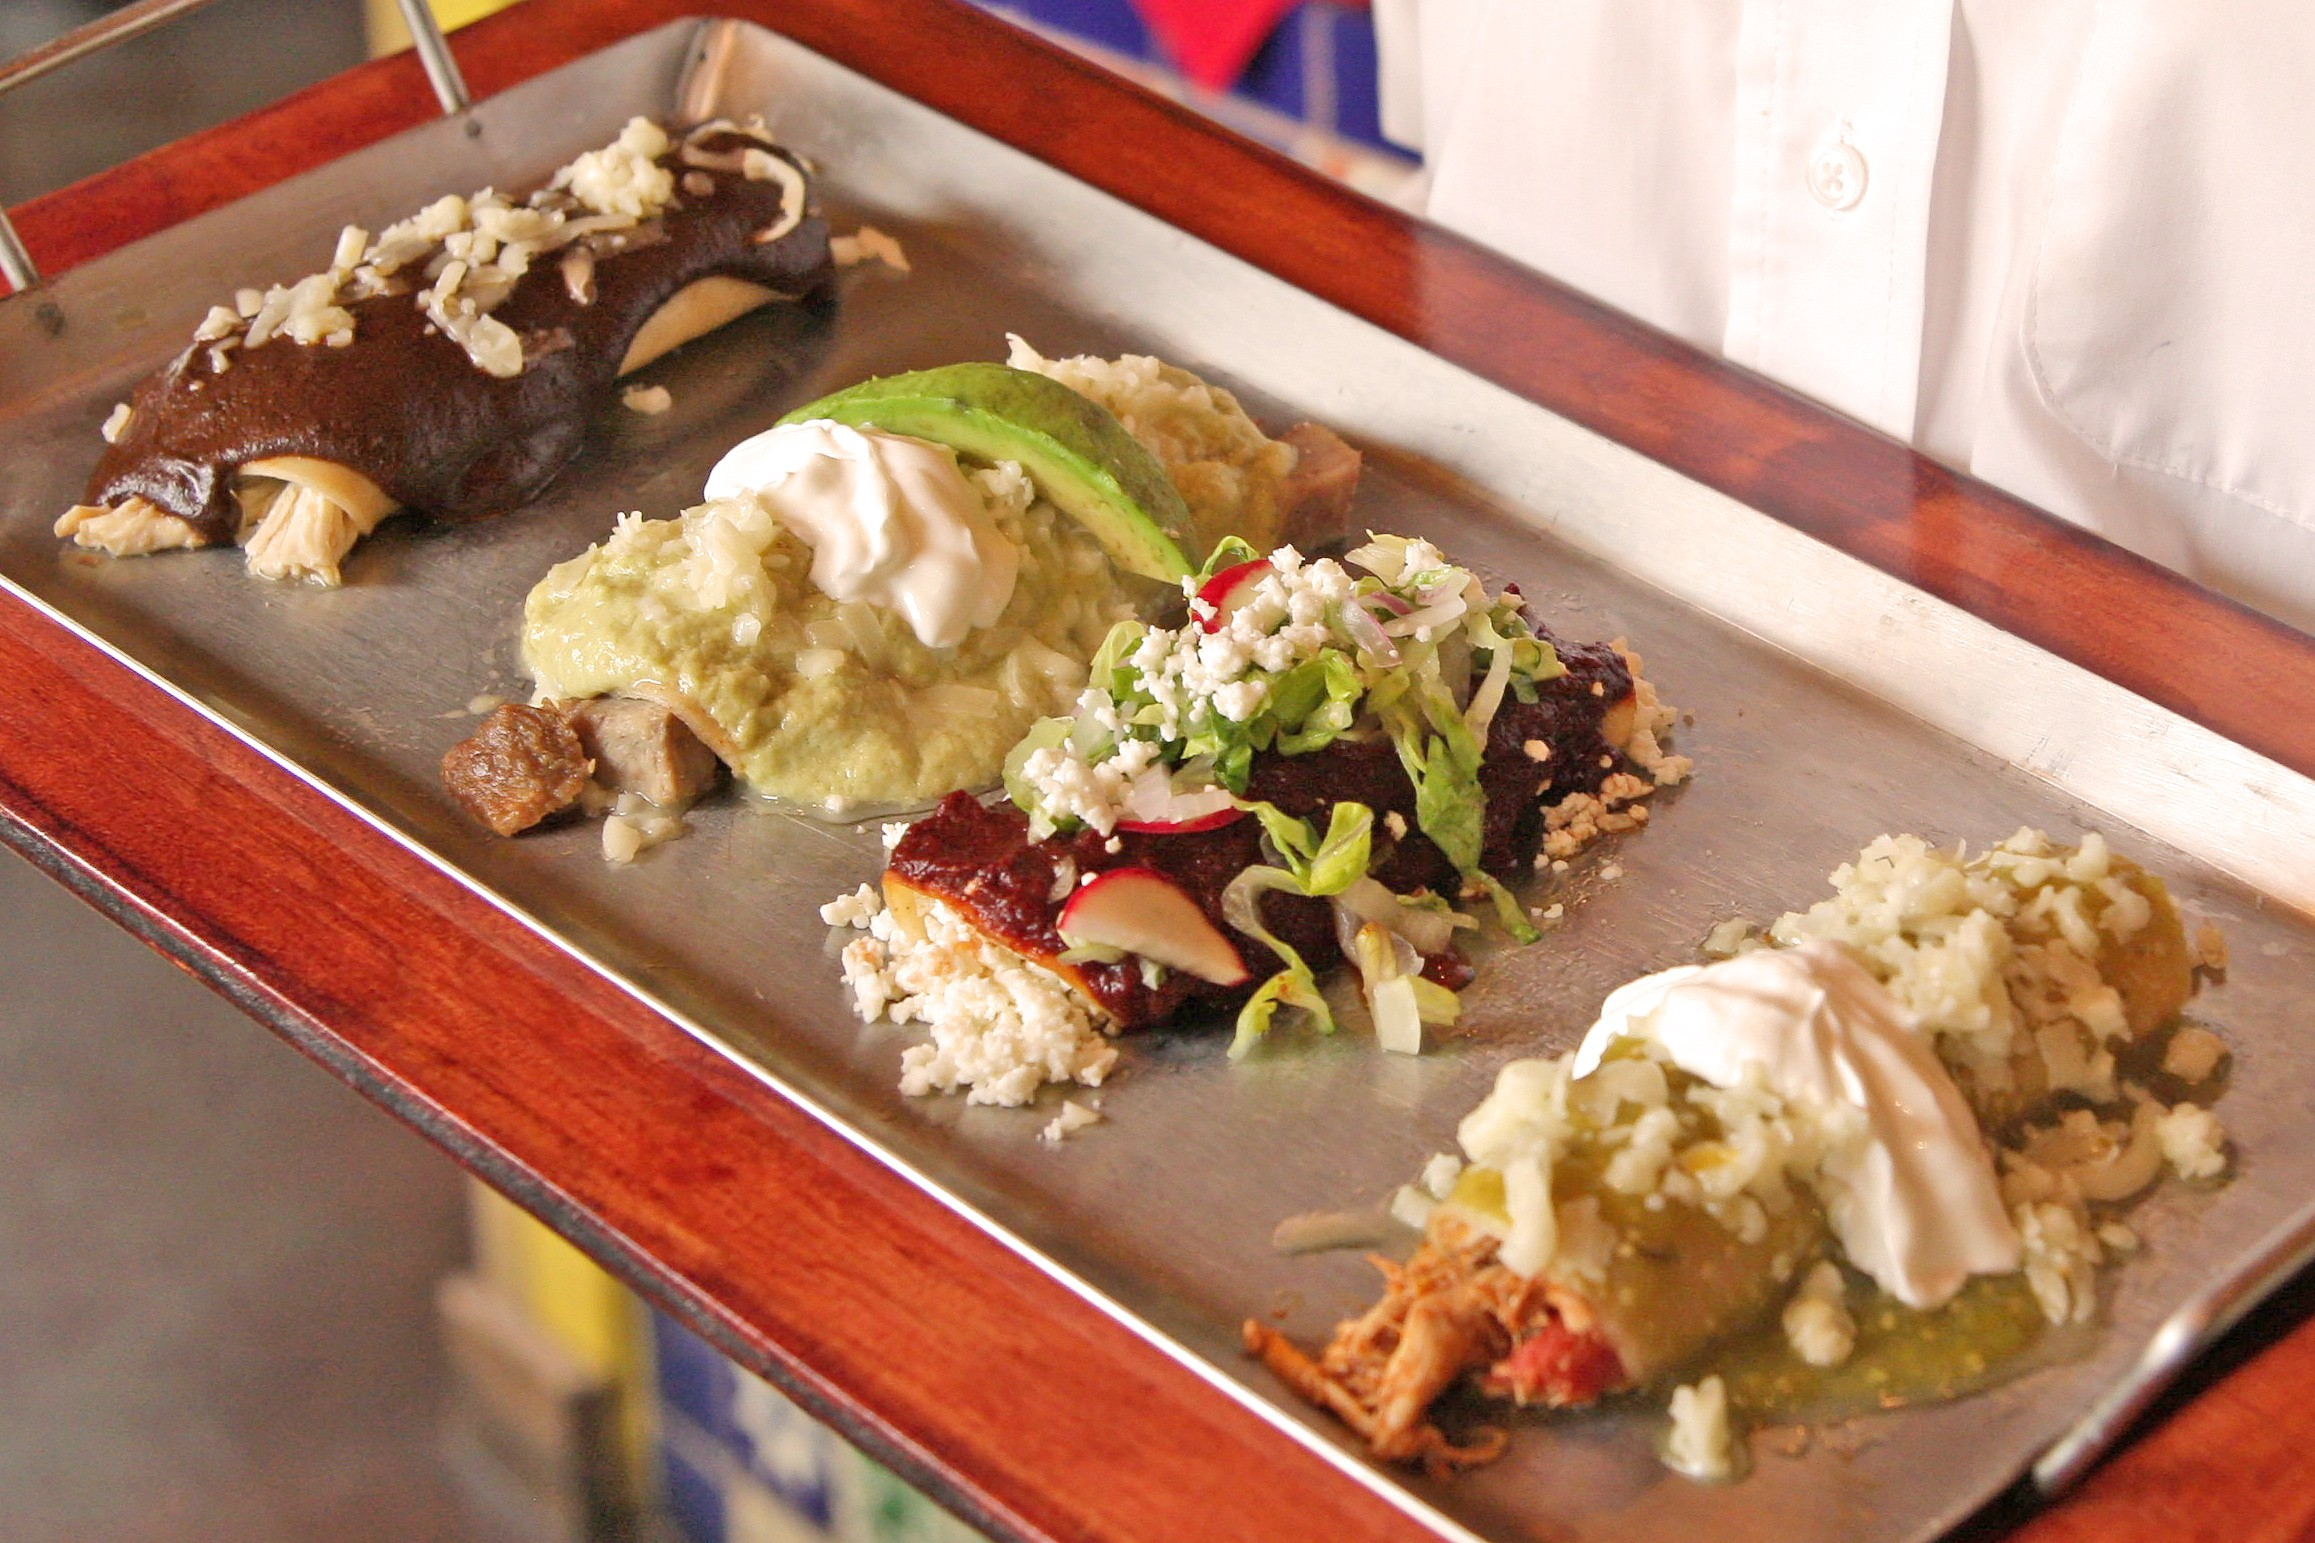 Sylvia's South of the Border Enchilada Sampler